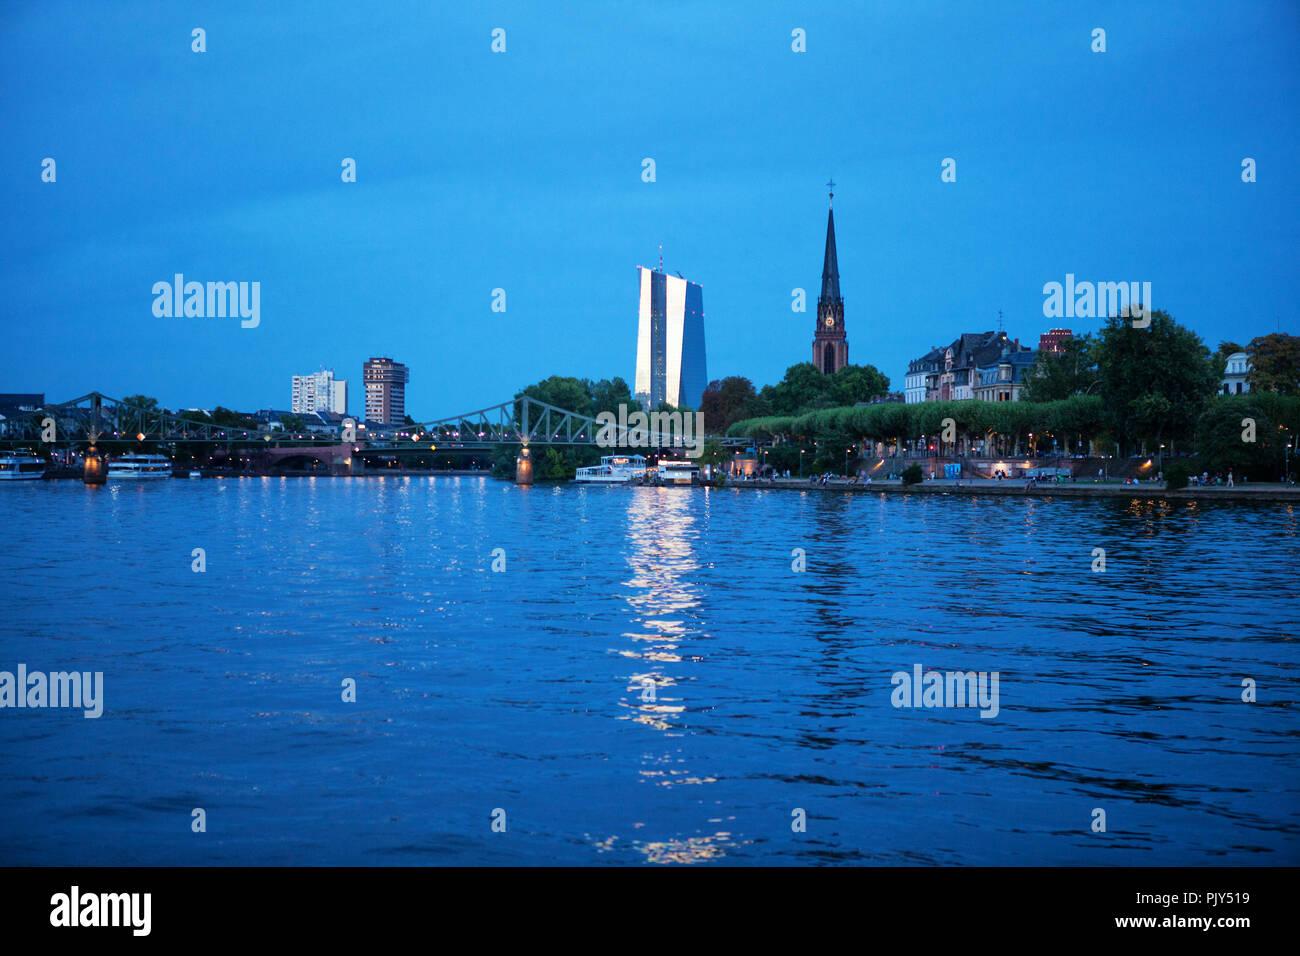 Europa Germany Hessen Rhein-Main Frankfurt am Main European Central Bank, Frankfurt - the new seat of the EZB - Stock Image